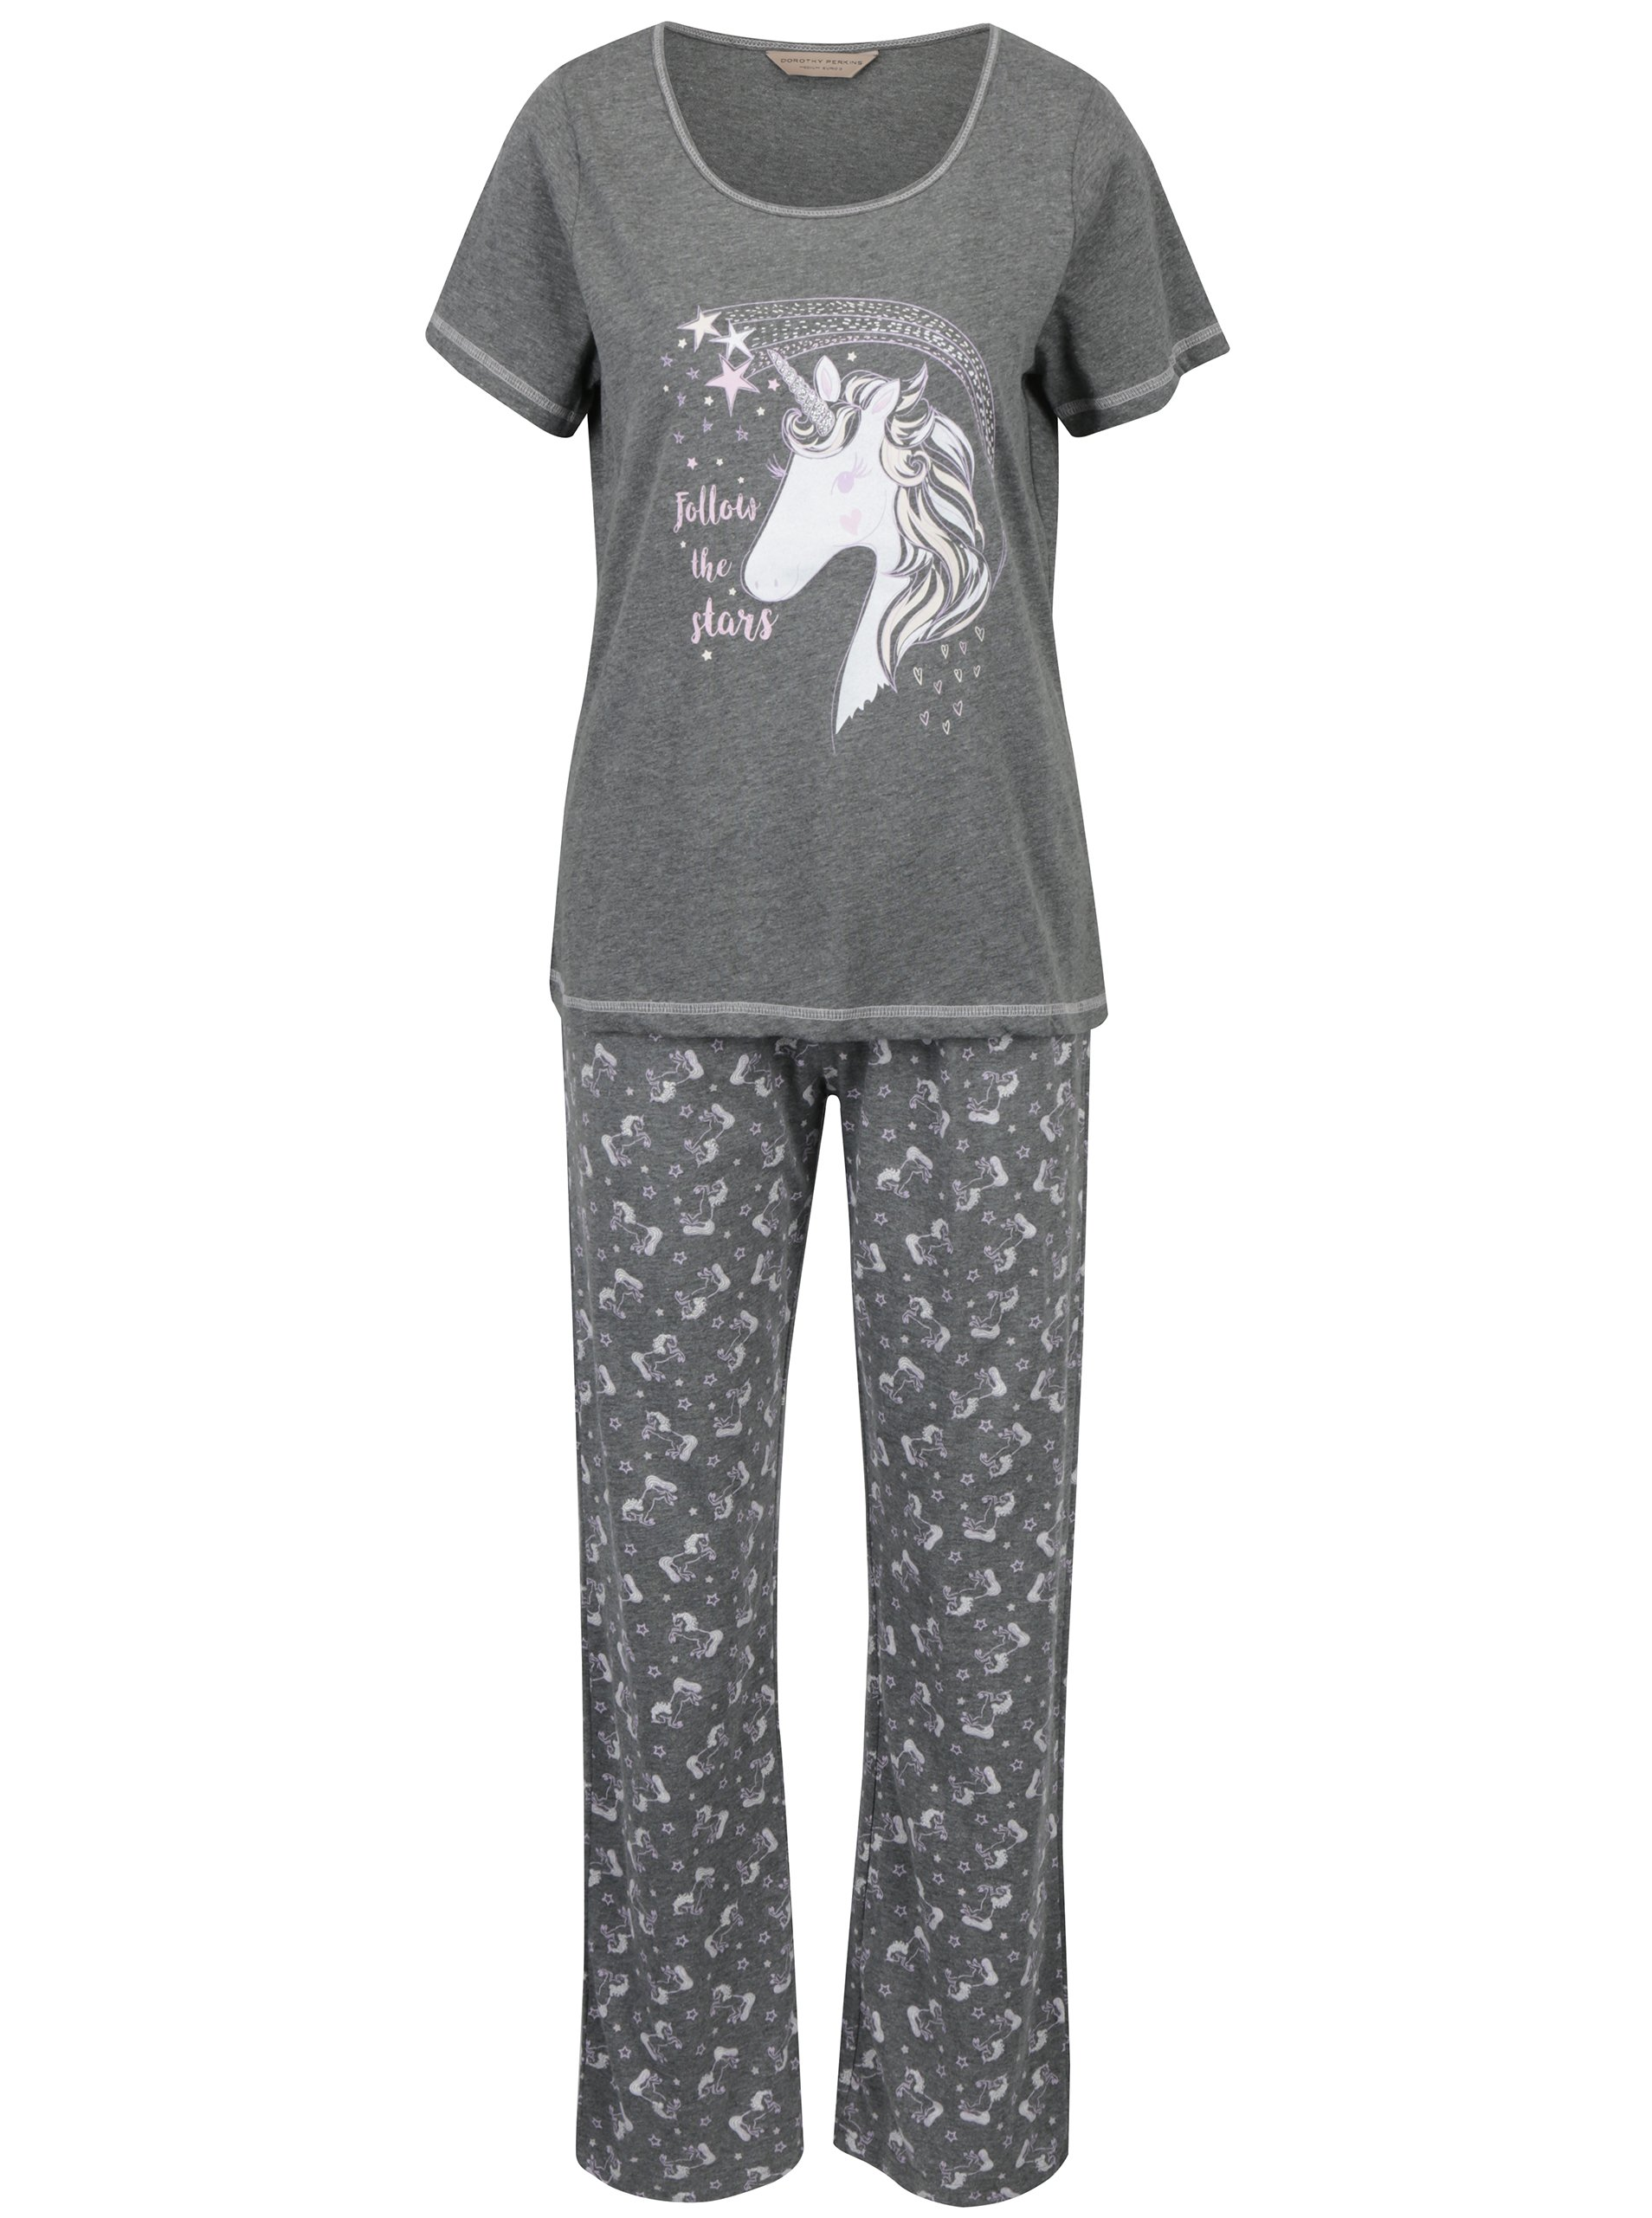 Šedé pyžamo s potiskem jednorožců Dorothy Perkins